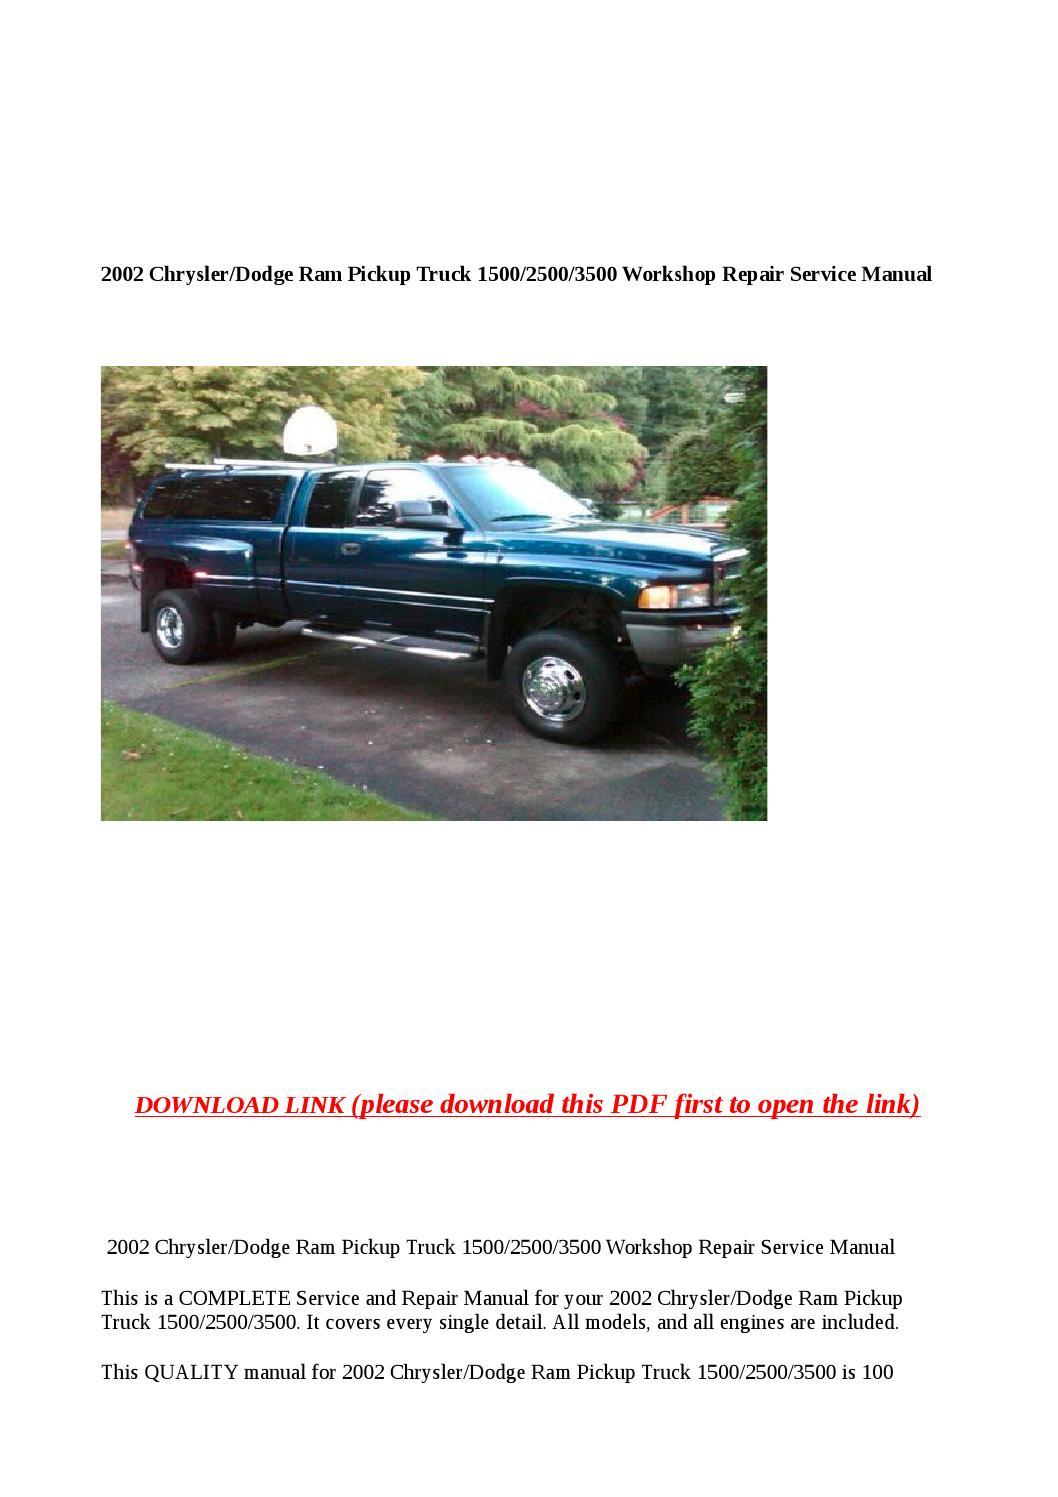 2002 Chrysler Dodge Ram Pickup Truck 1500 2500 3500 Workshop Repair Service Manual By Anna Tang